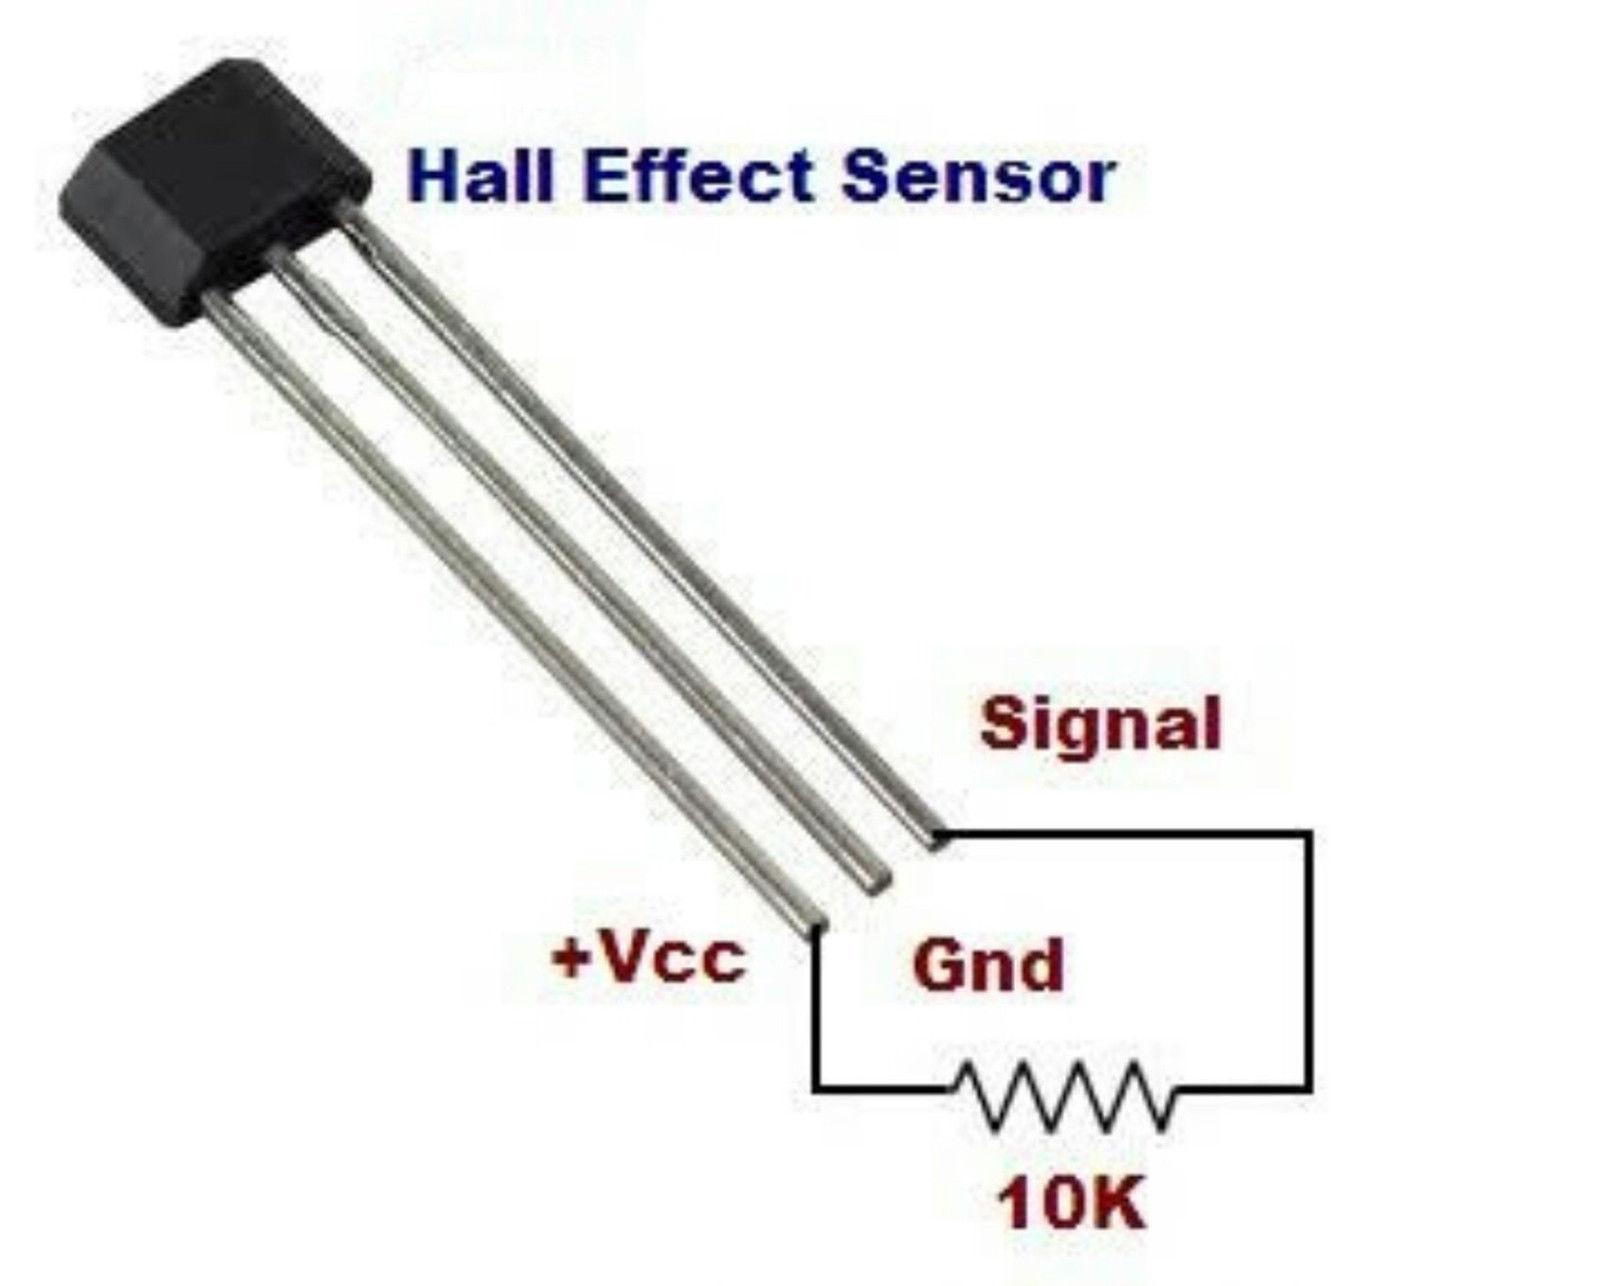 5 X A3144 Hall Effect Sensor Switch All Top Notch Circuits